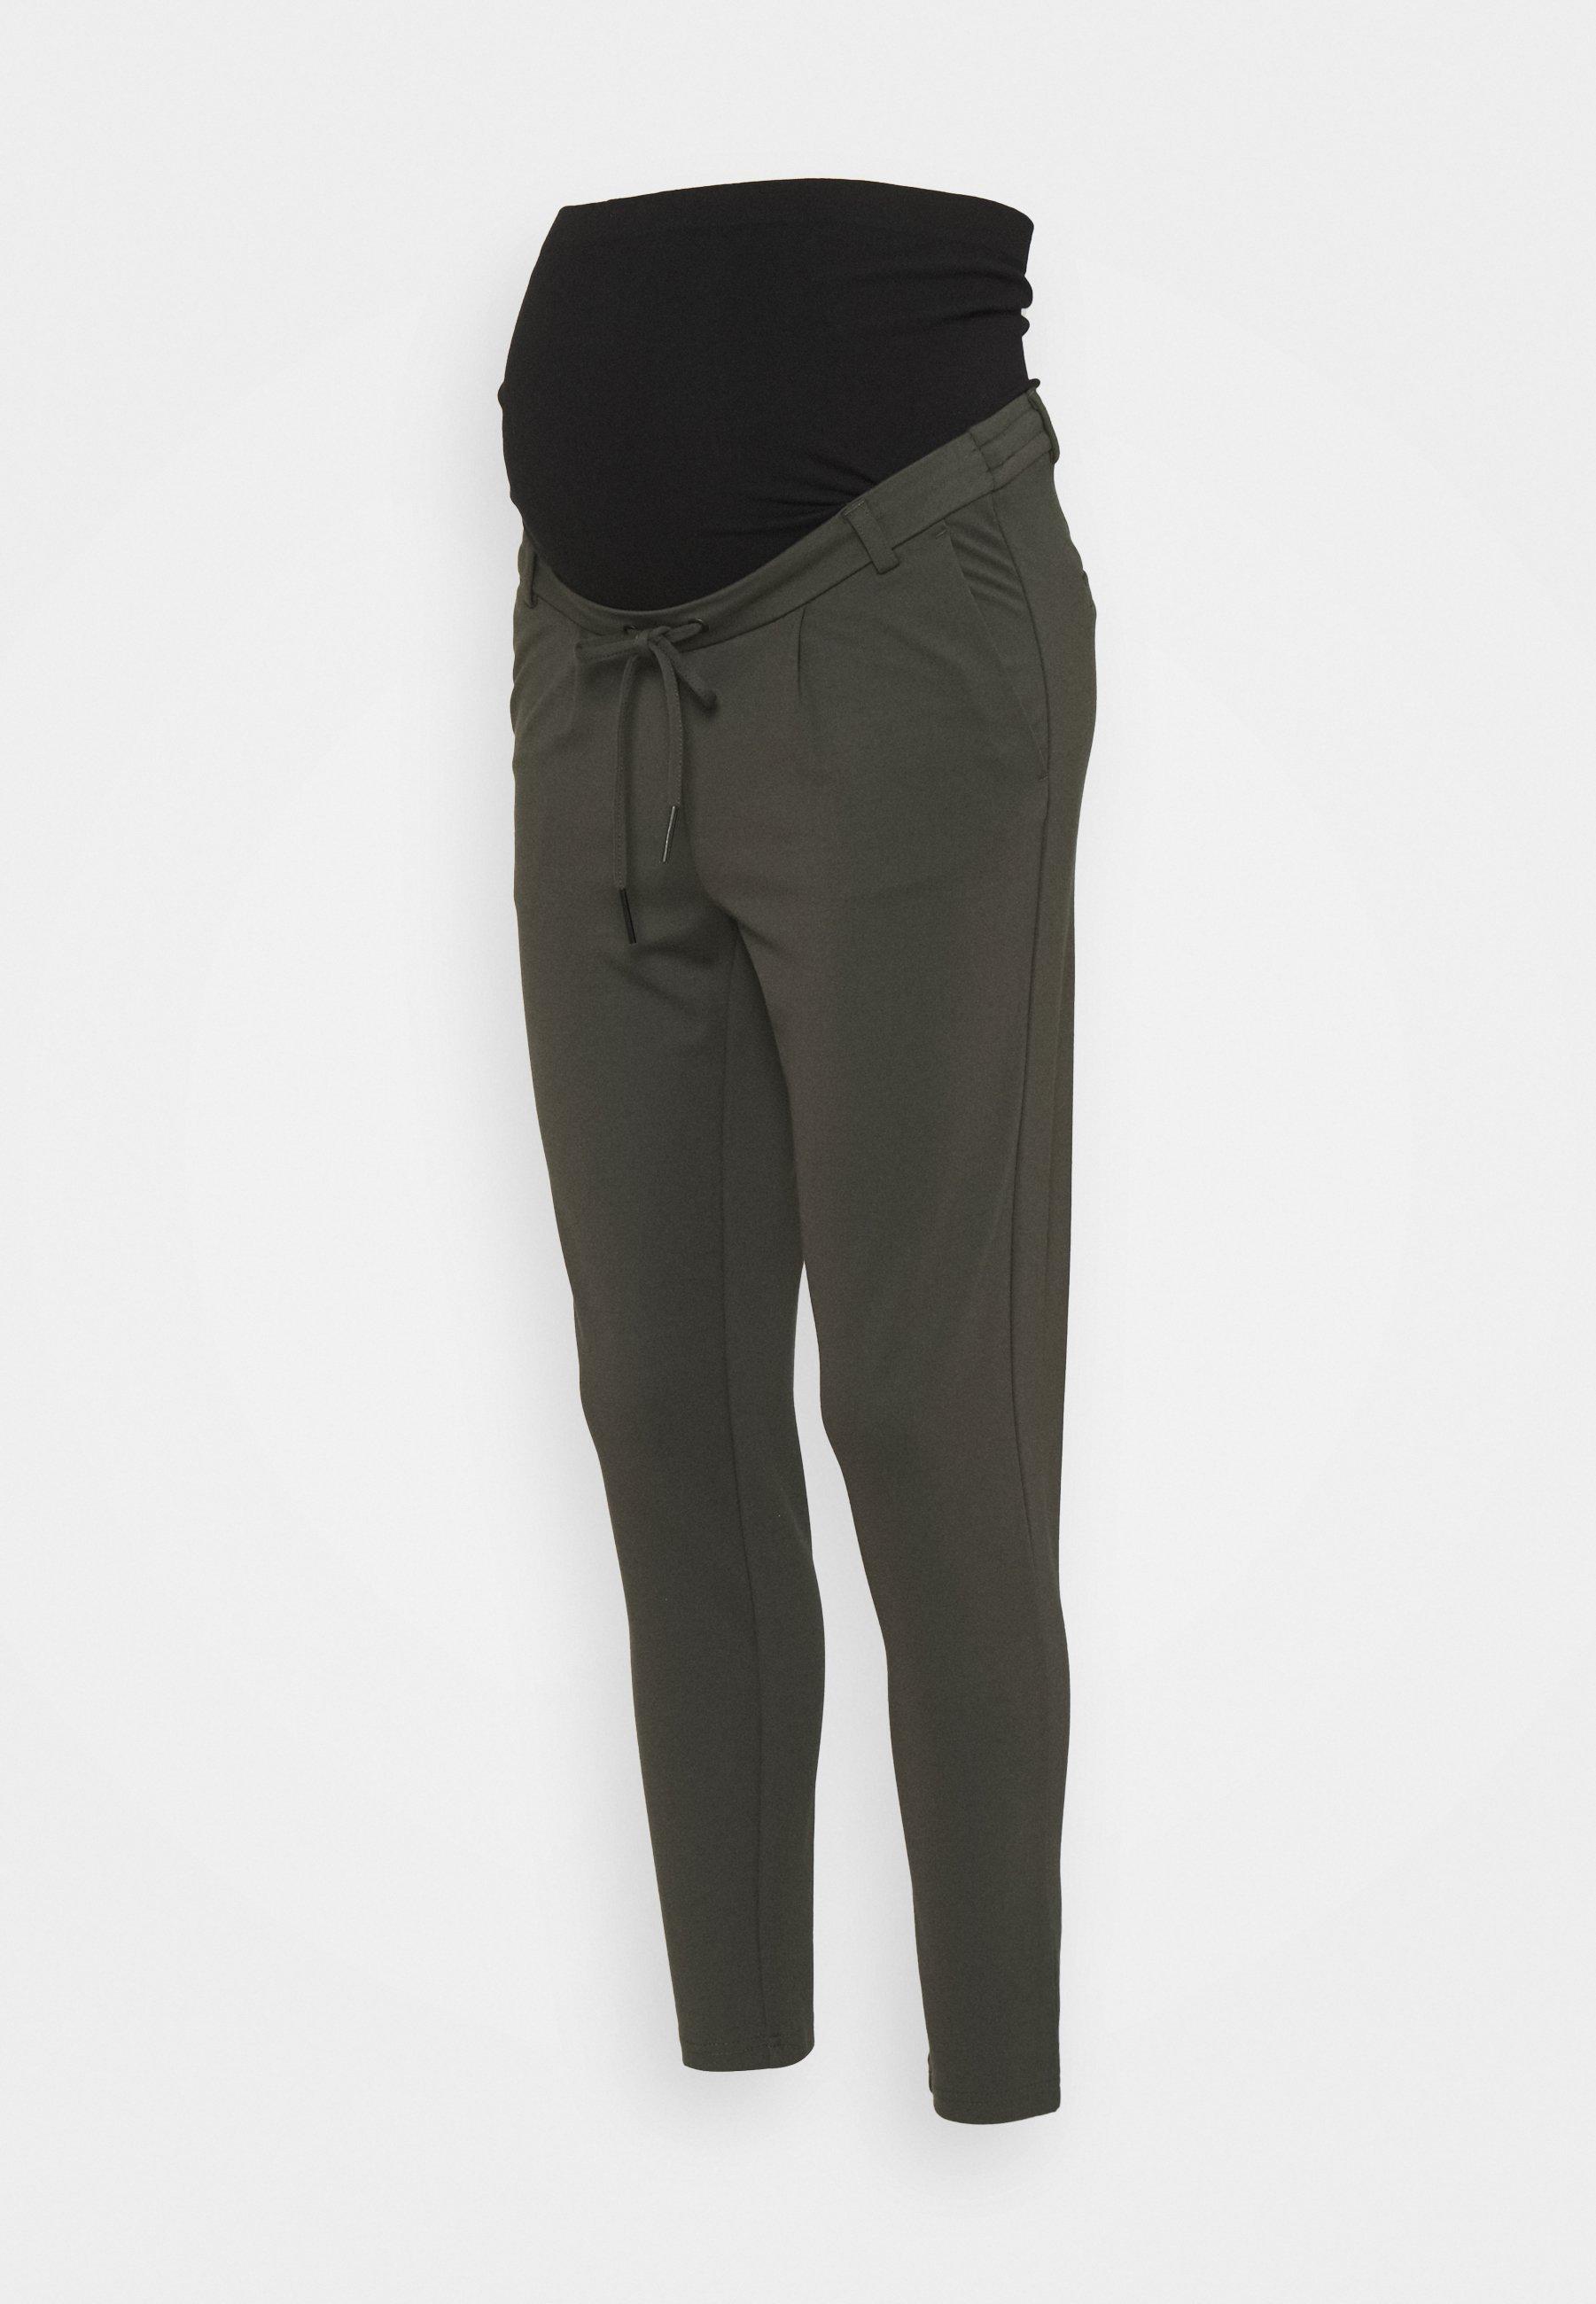 Mujer OLMPOPTRASH EASY LIFE PANT - Pantalones